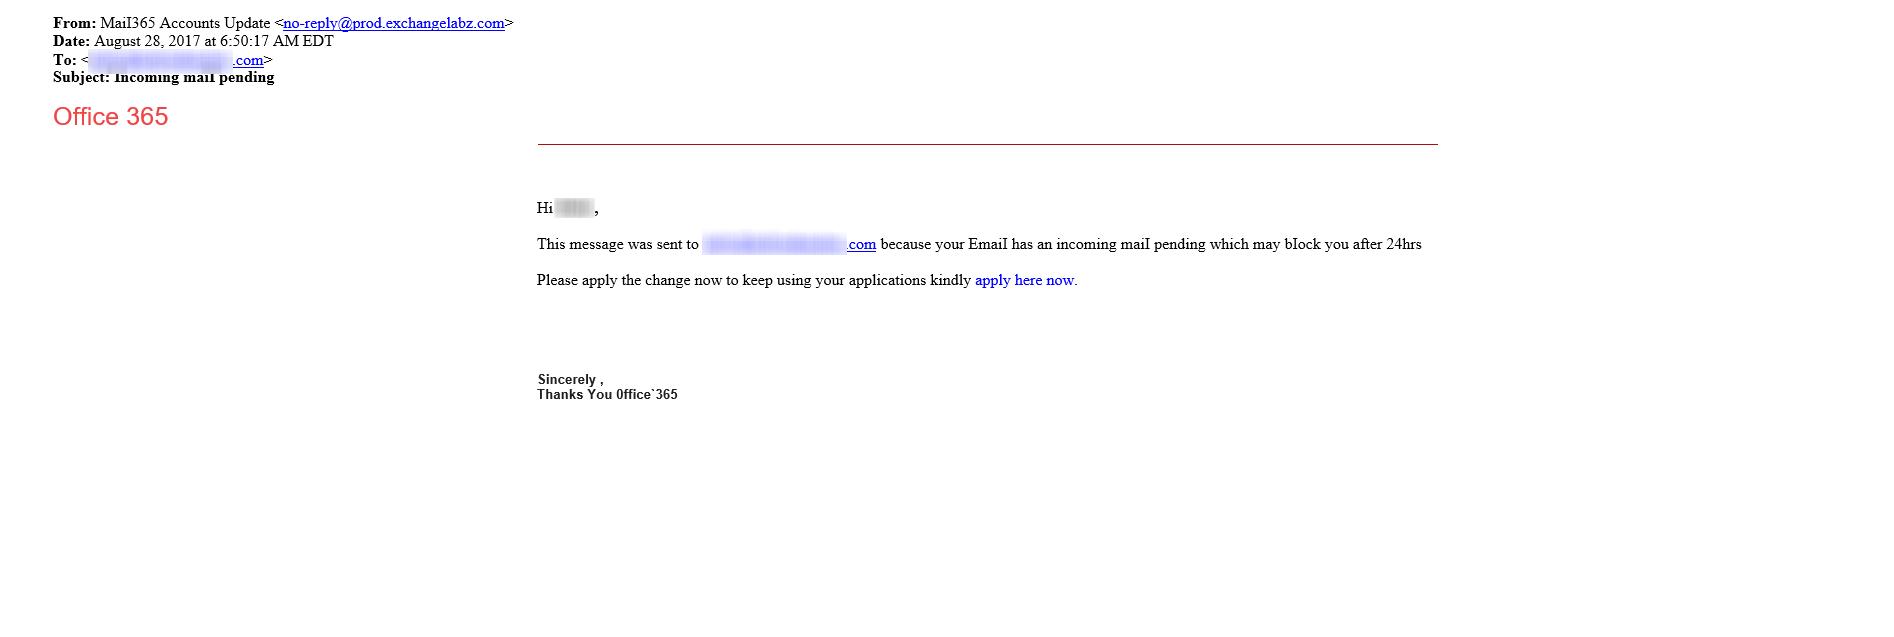 Office 365 Phishing Attempt